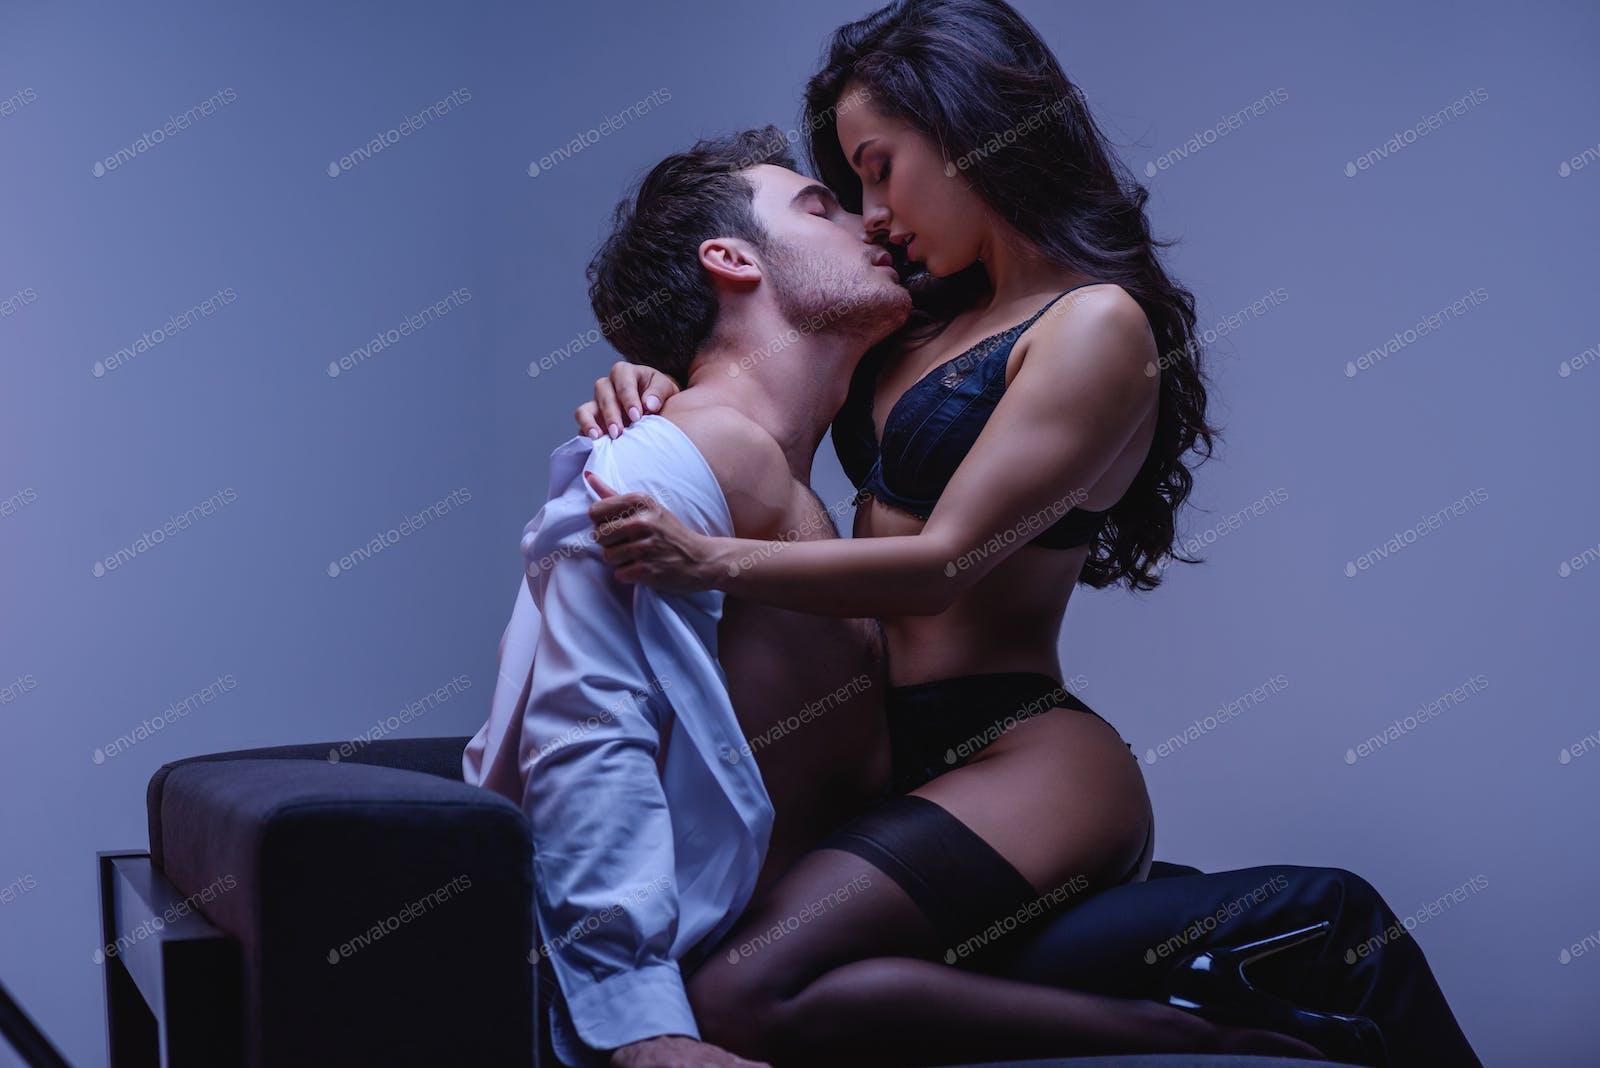 Man hot kiss 15 Types